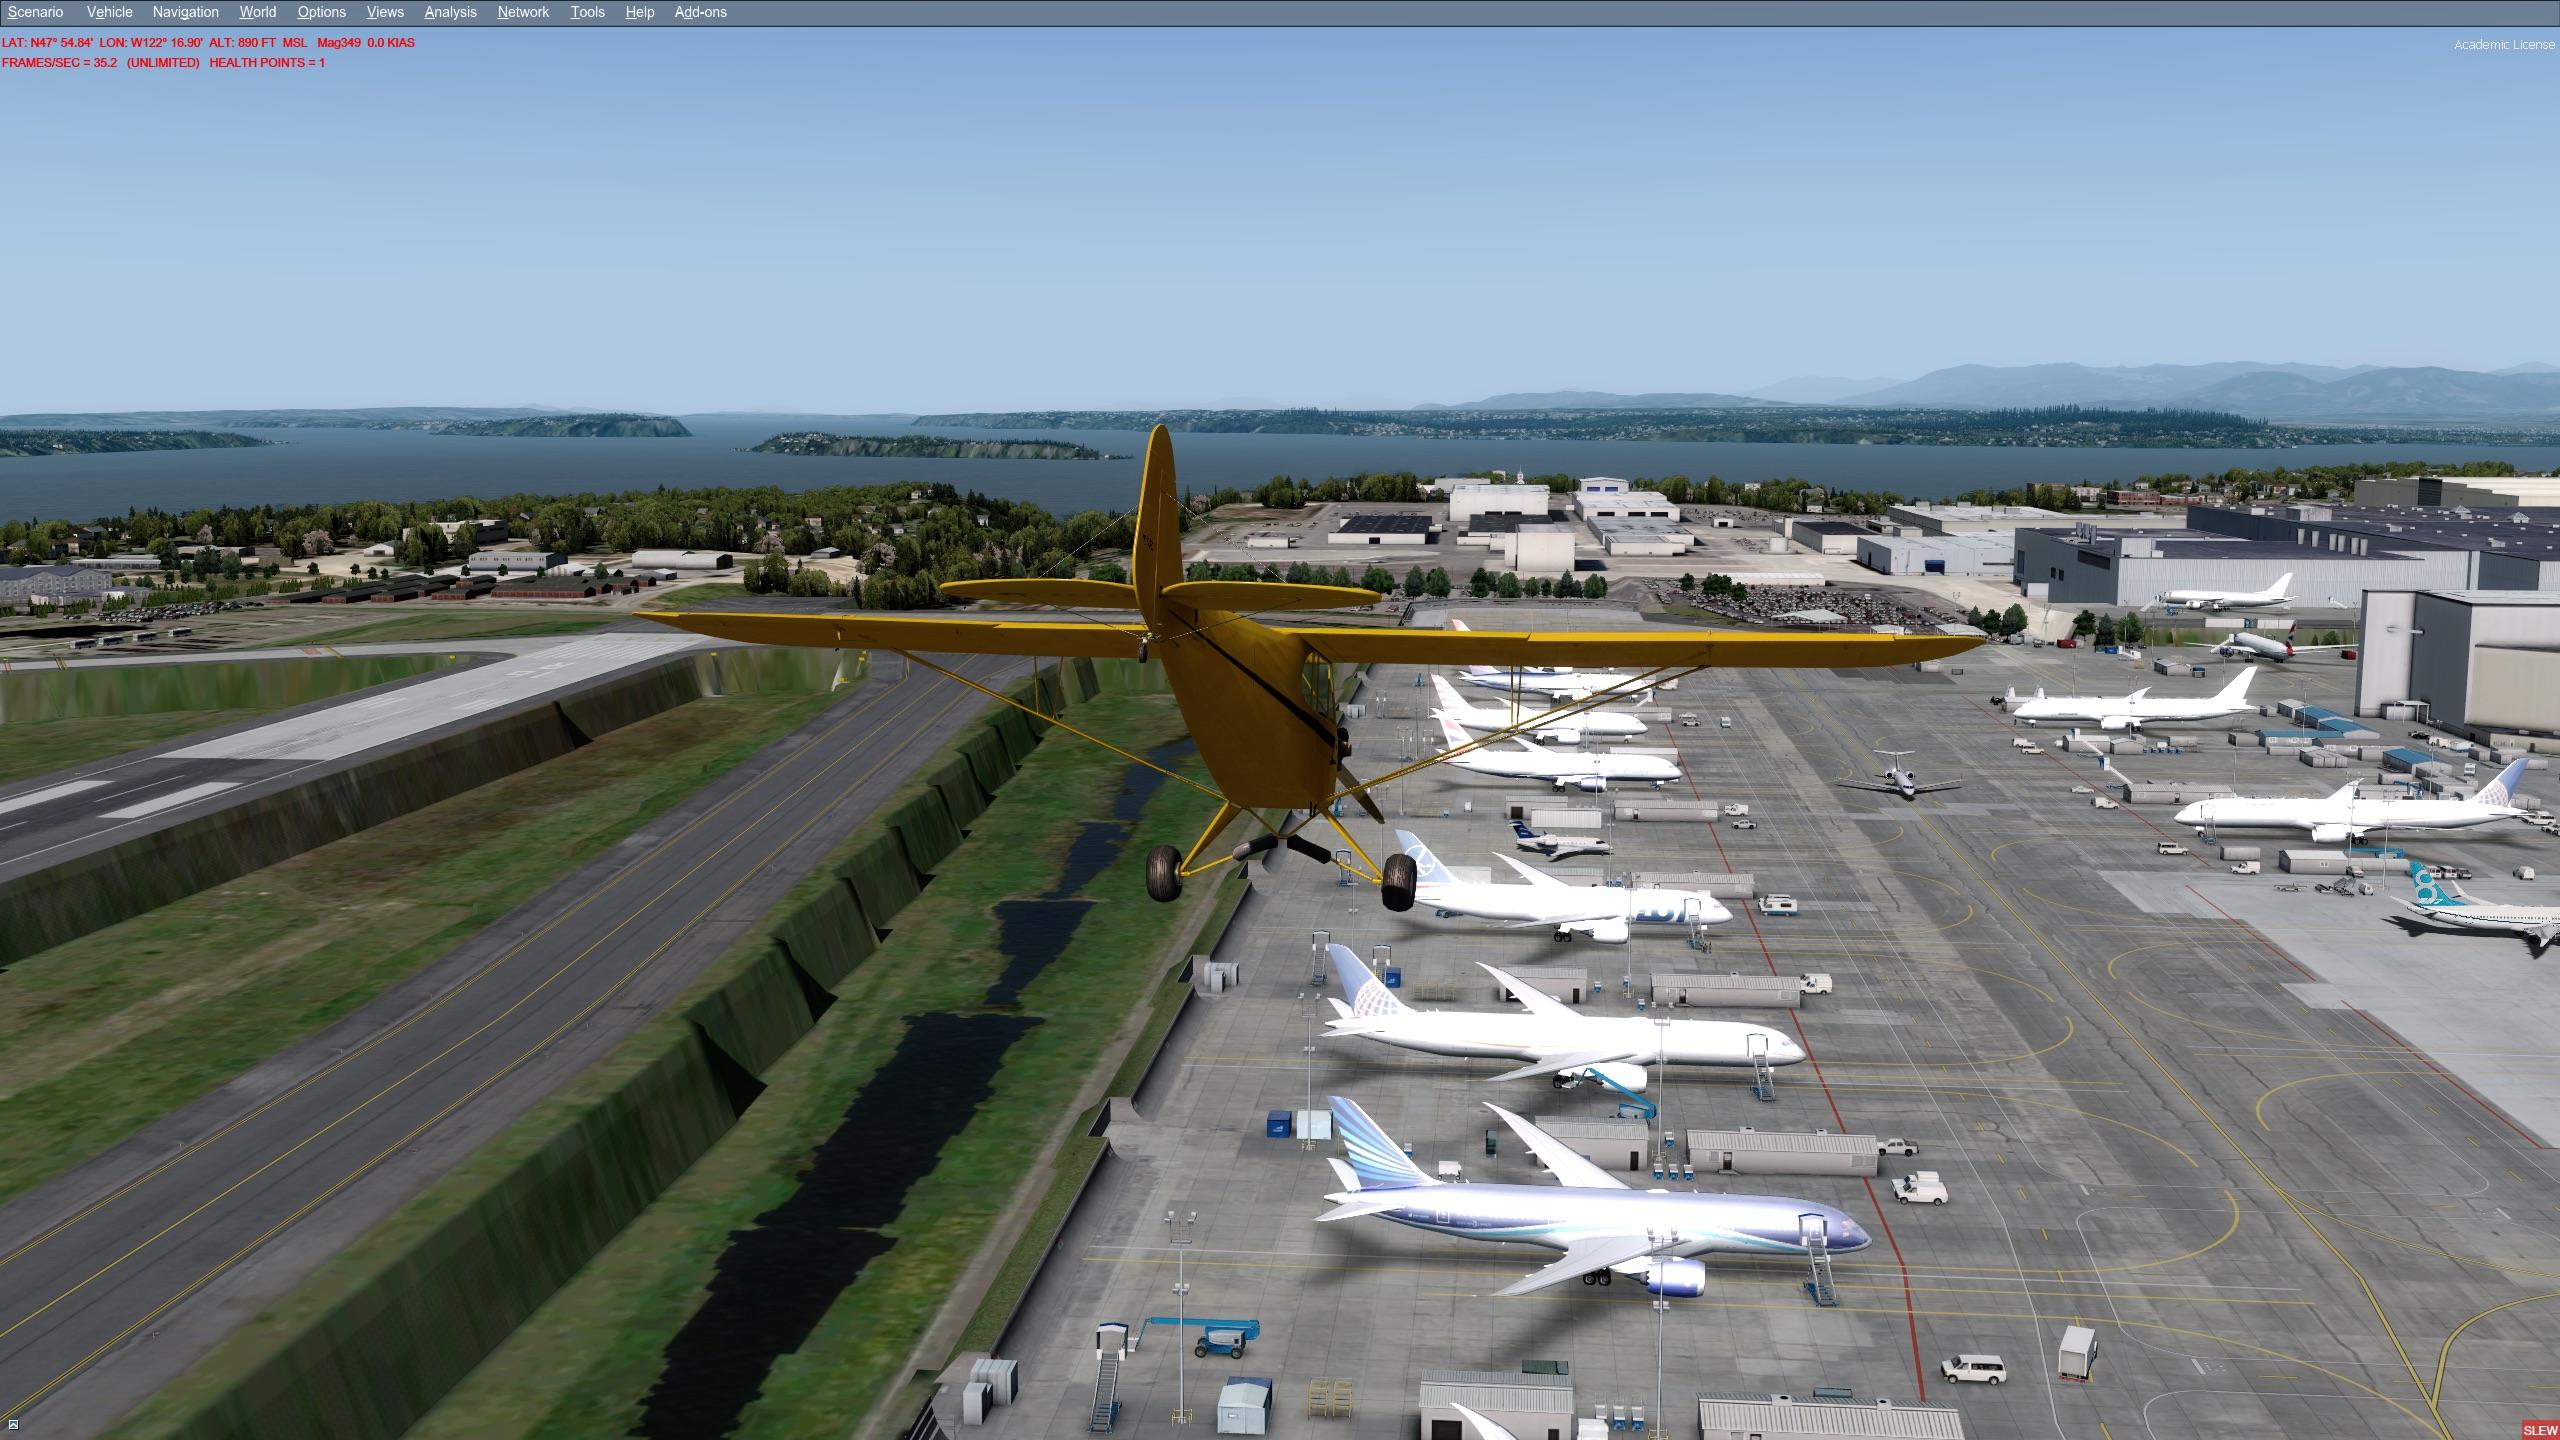 Seattle Airports X - Strona 9 - Drzewiecki Design